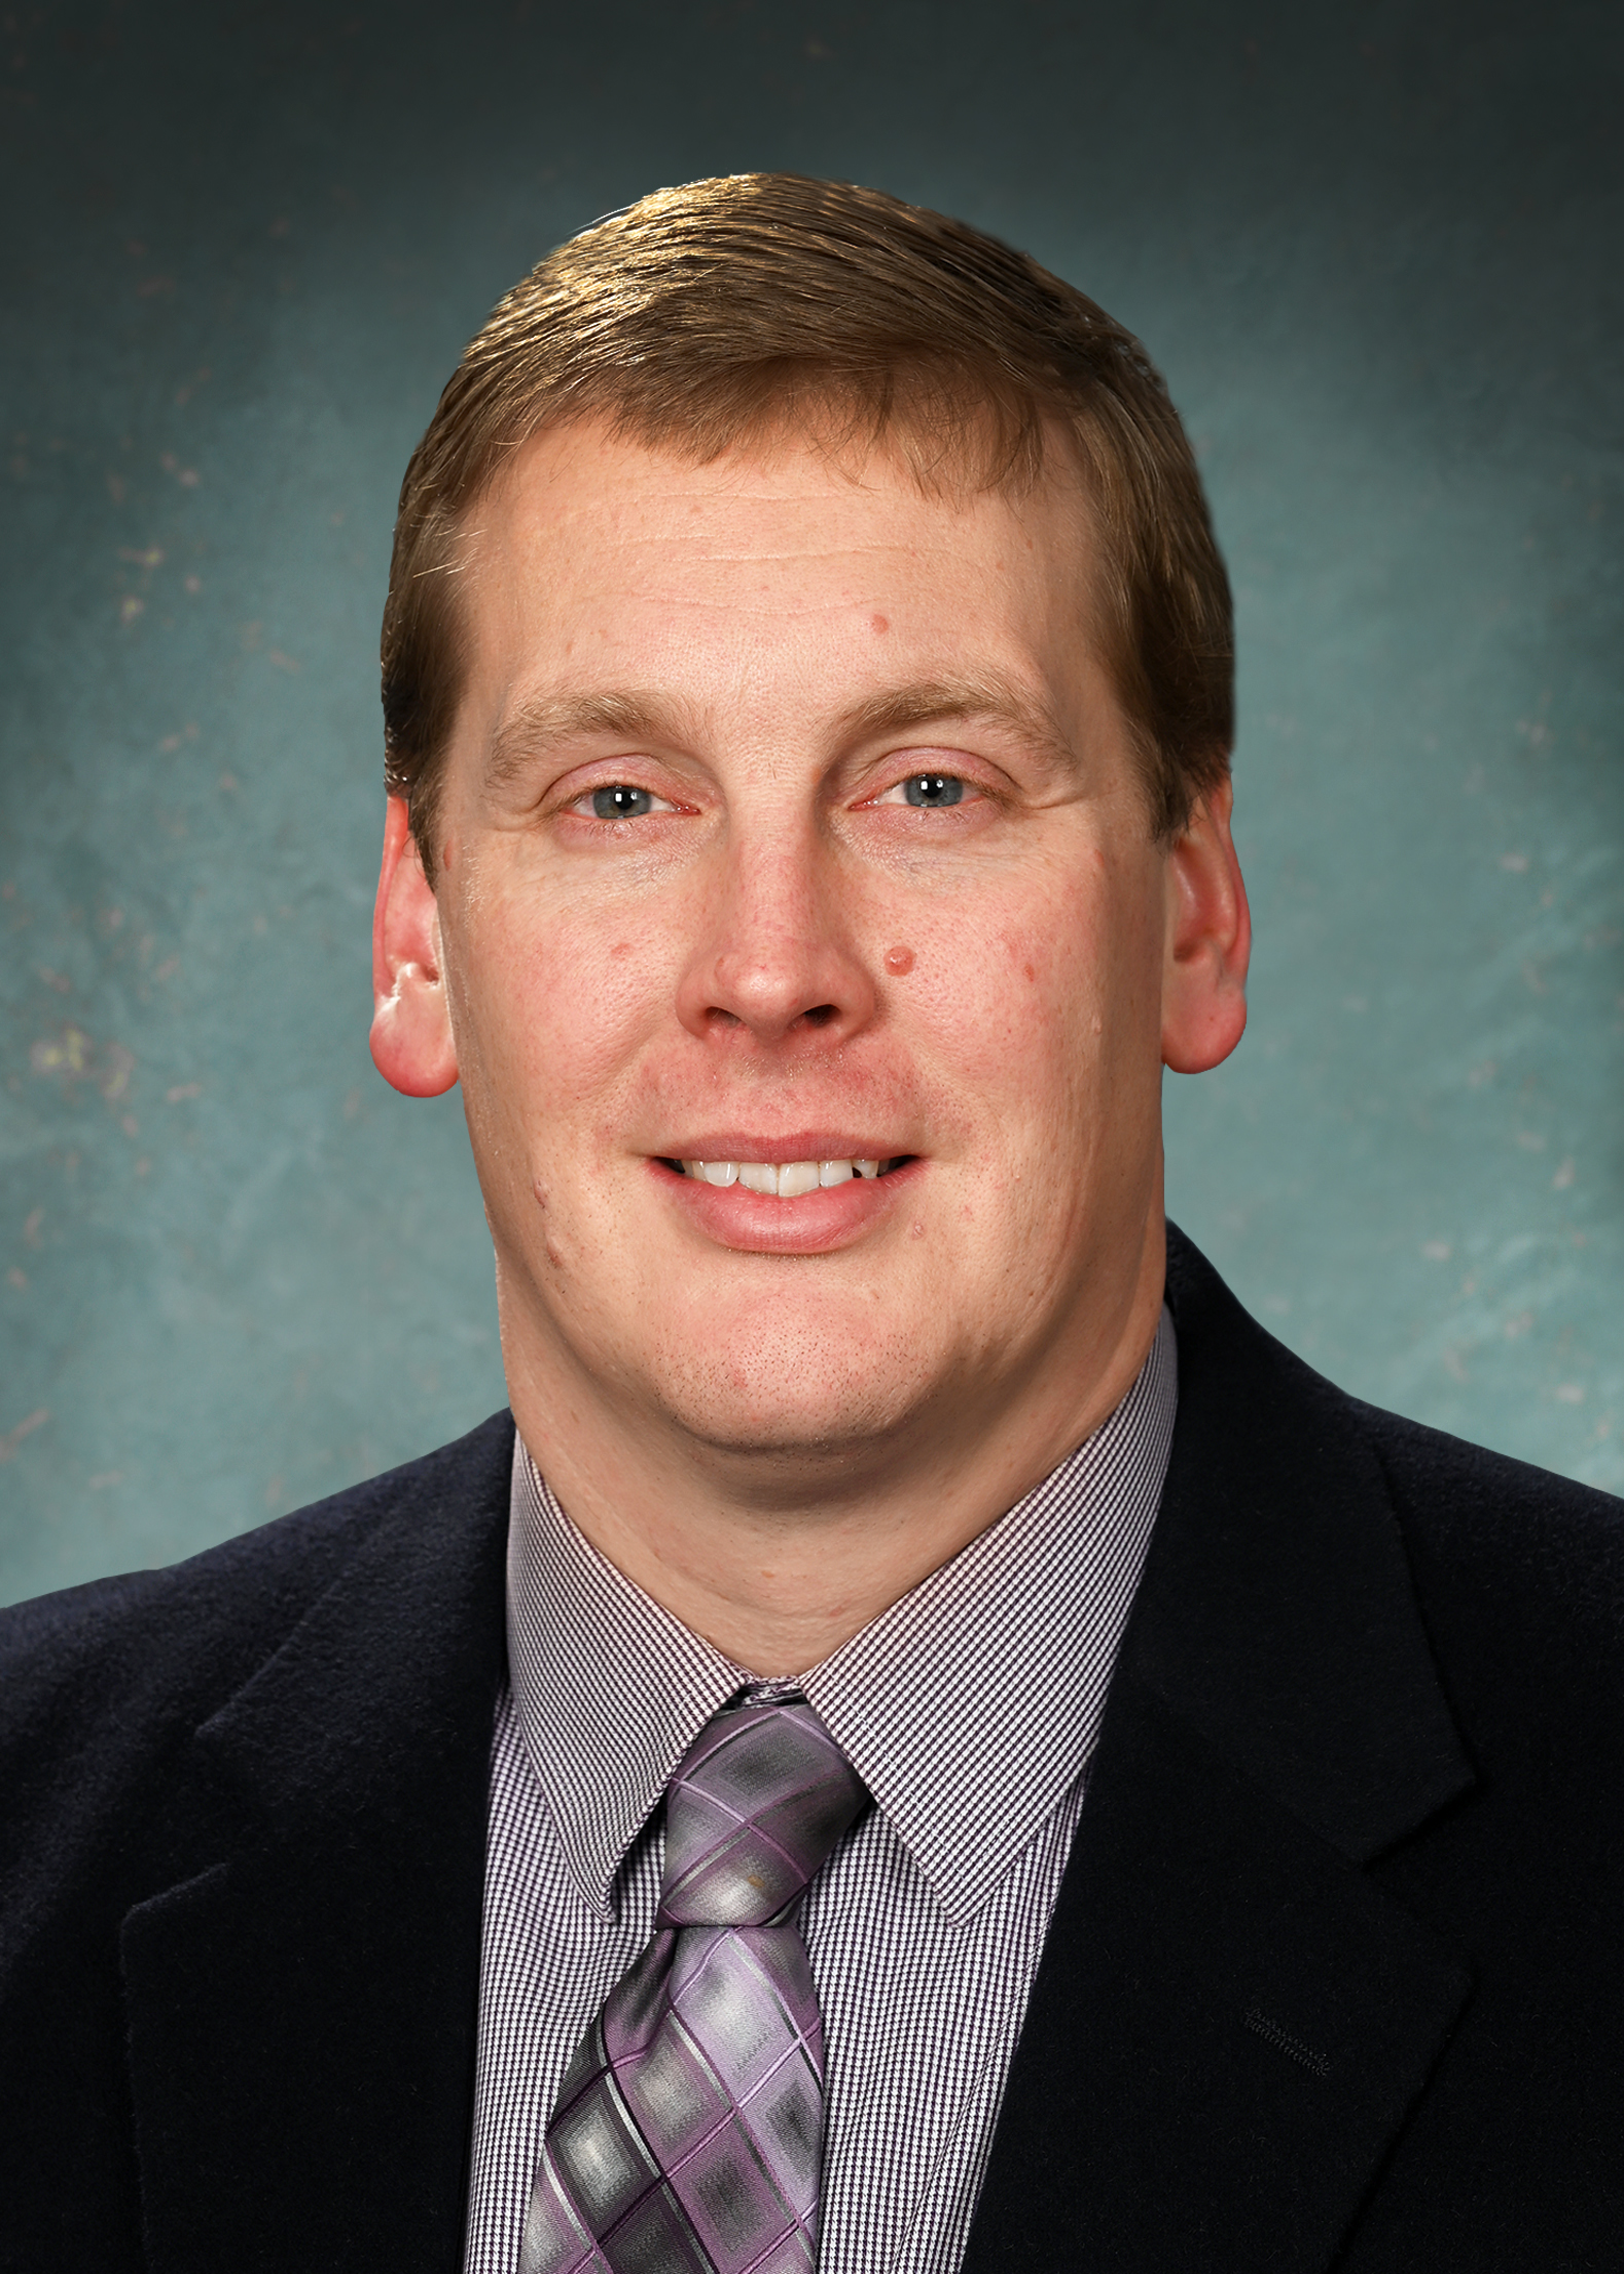 Senator Ed McBroom